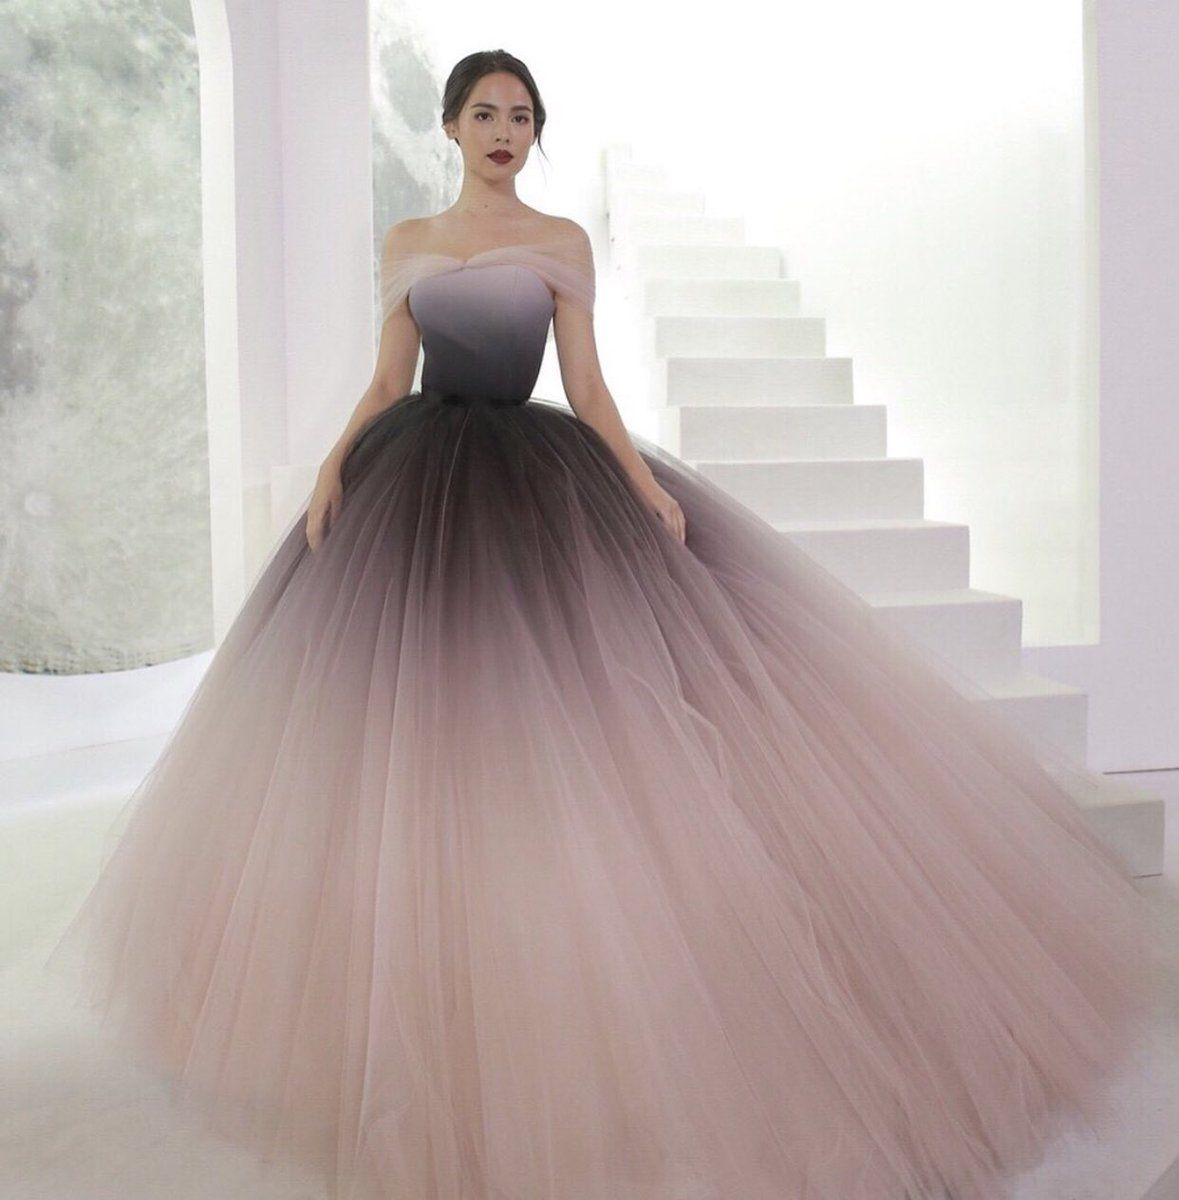 Off-the-shoulder Ombre Prom Dresses Unique Prom Dress Long Evening